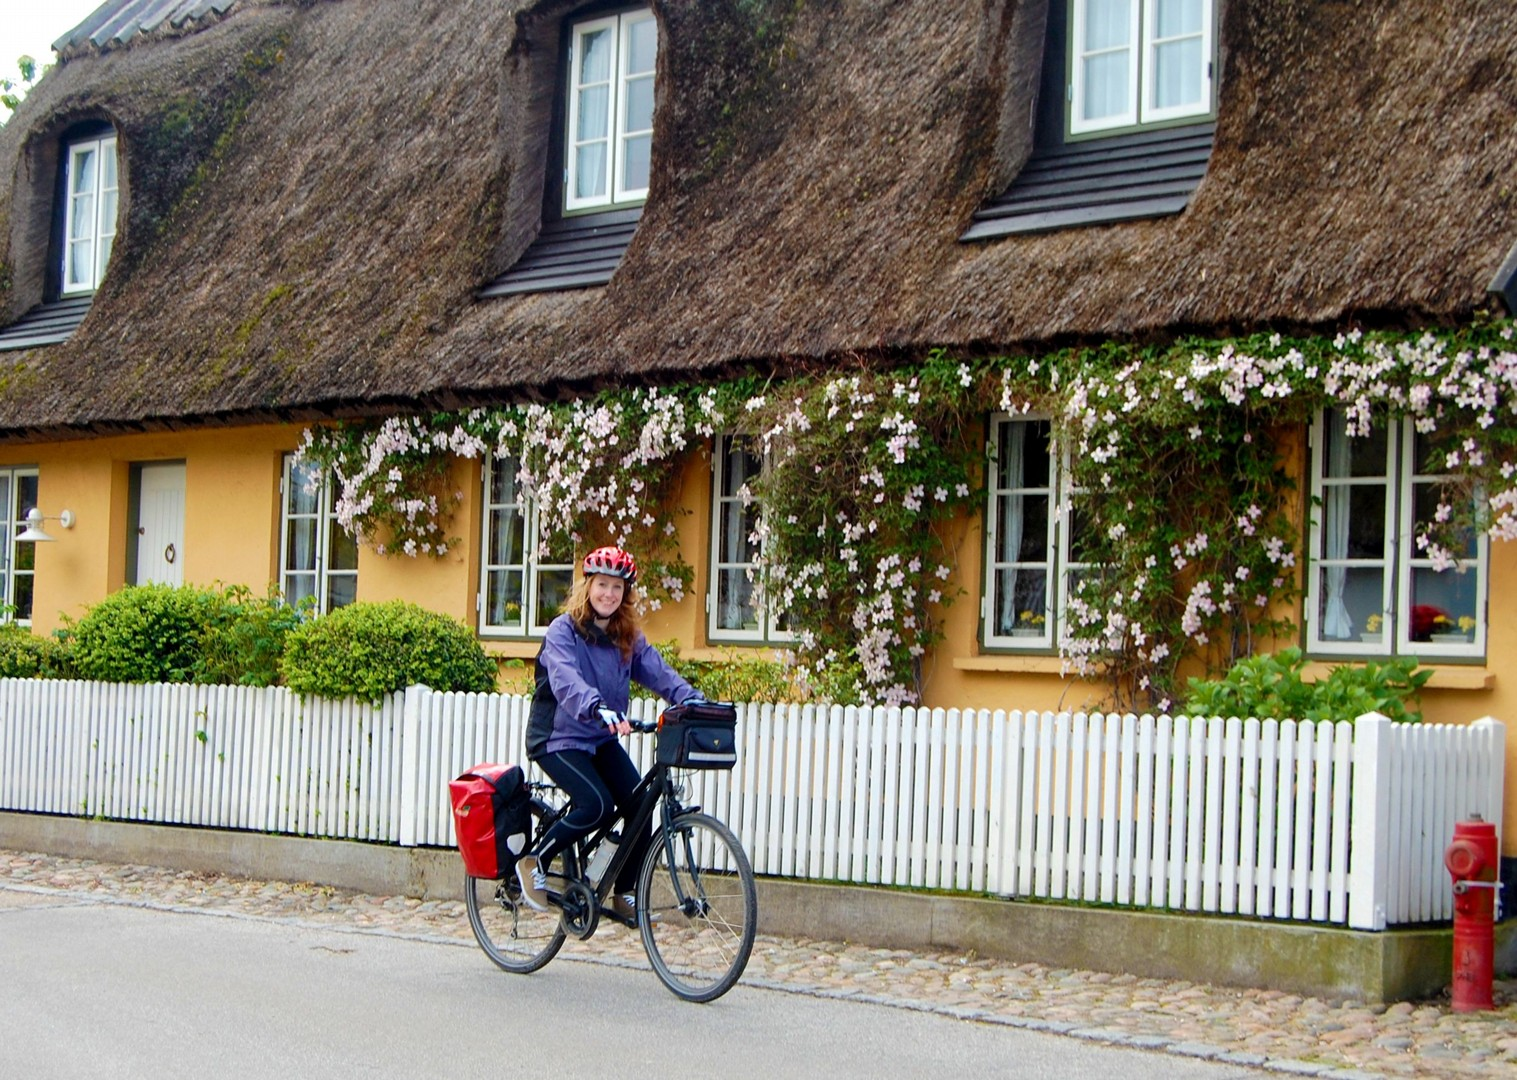 traditional-danish-houses-denmark-leisure-holiday.jpg - Denmark - Coast, Castles and Copenhagen - Self-Guided Leisure Cycling Holiday - Leisure Cycling